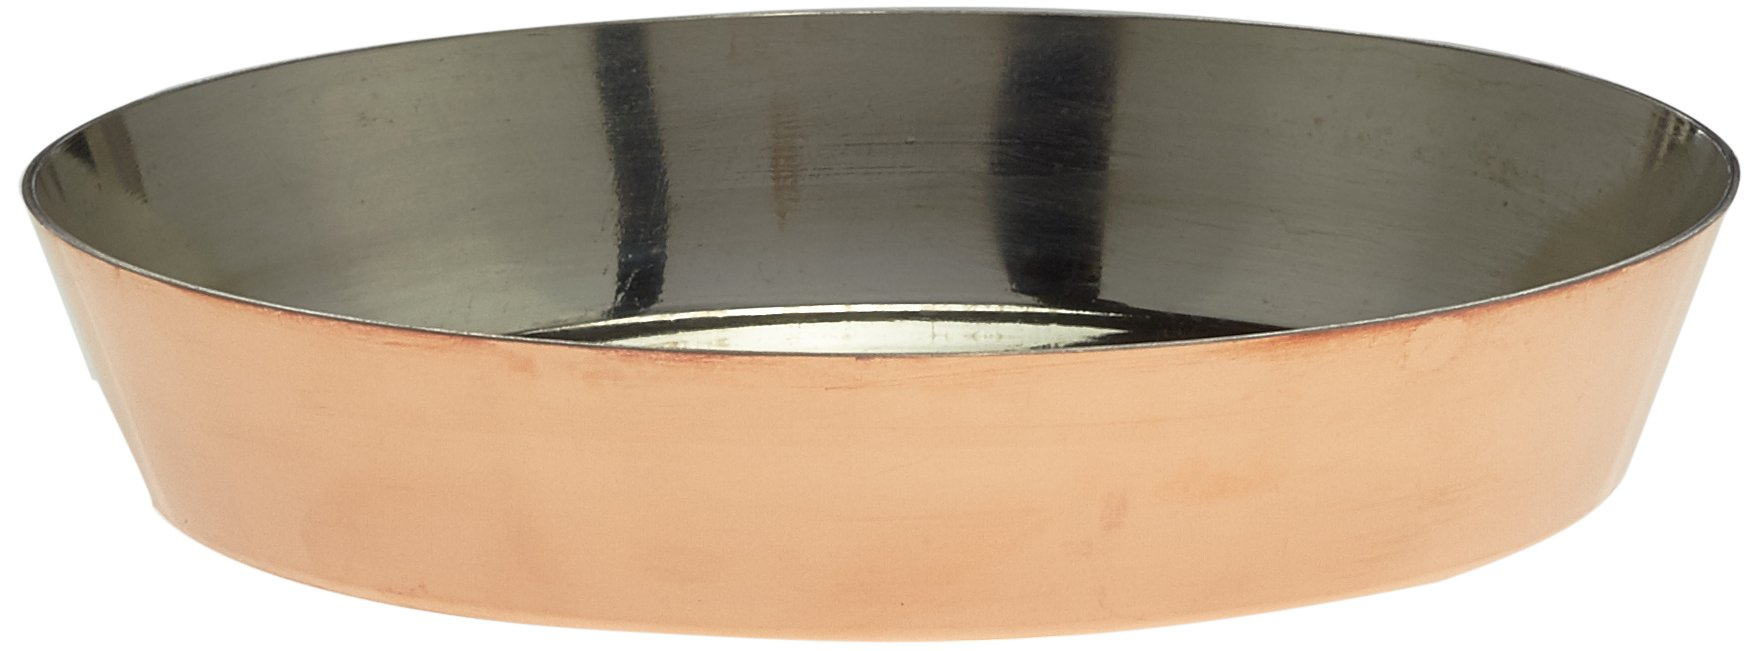 Bourgeat Copper Tin-Lined Tart Tatin Mold 11'' X 1 7/8''